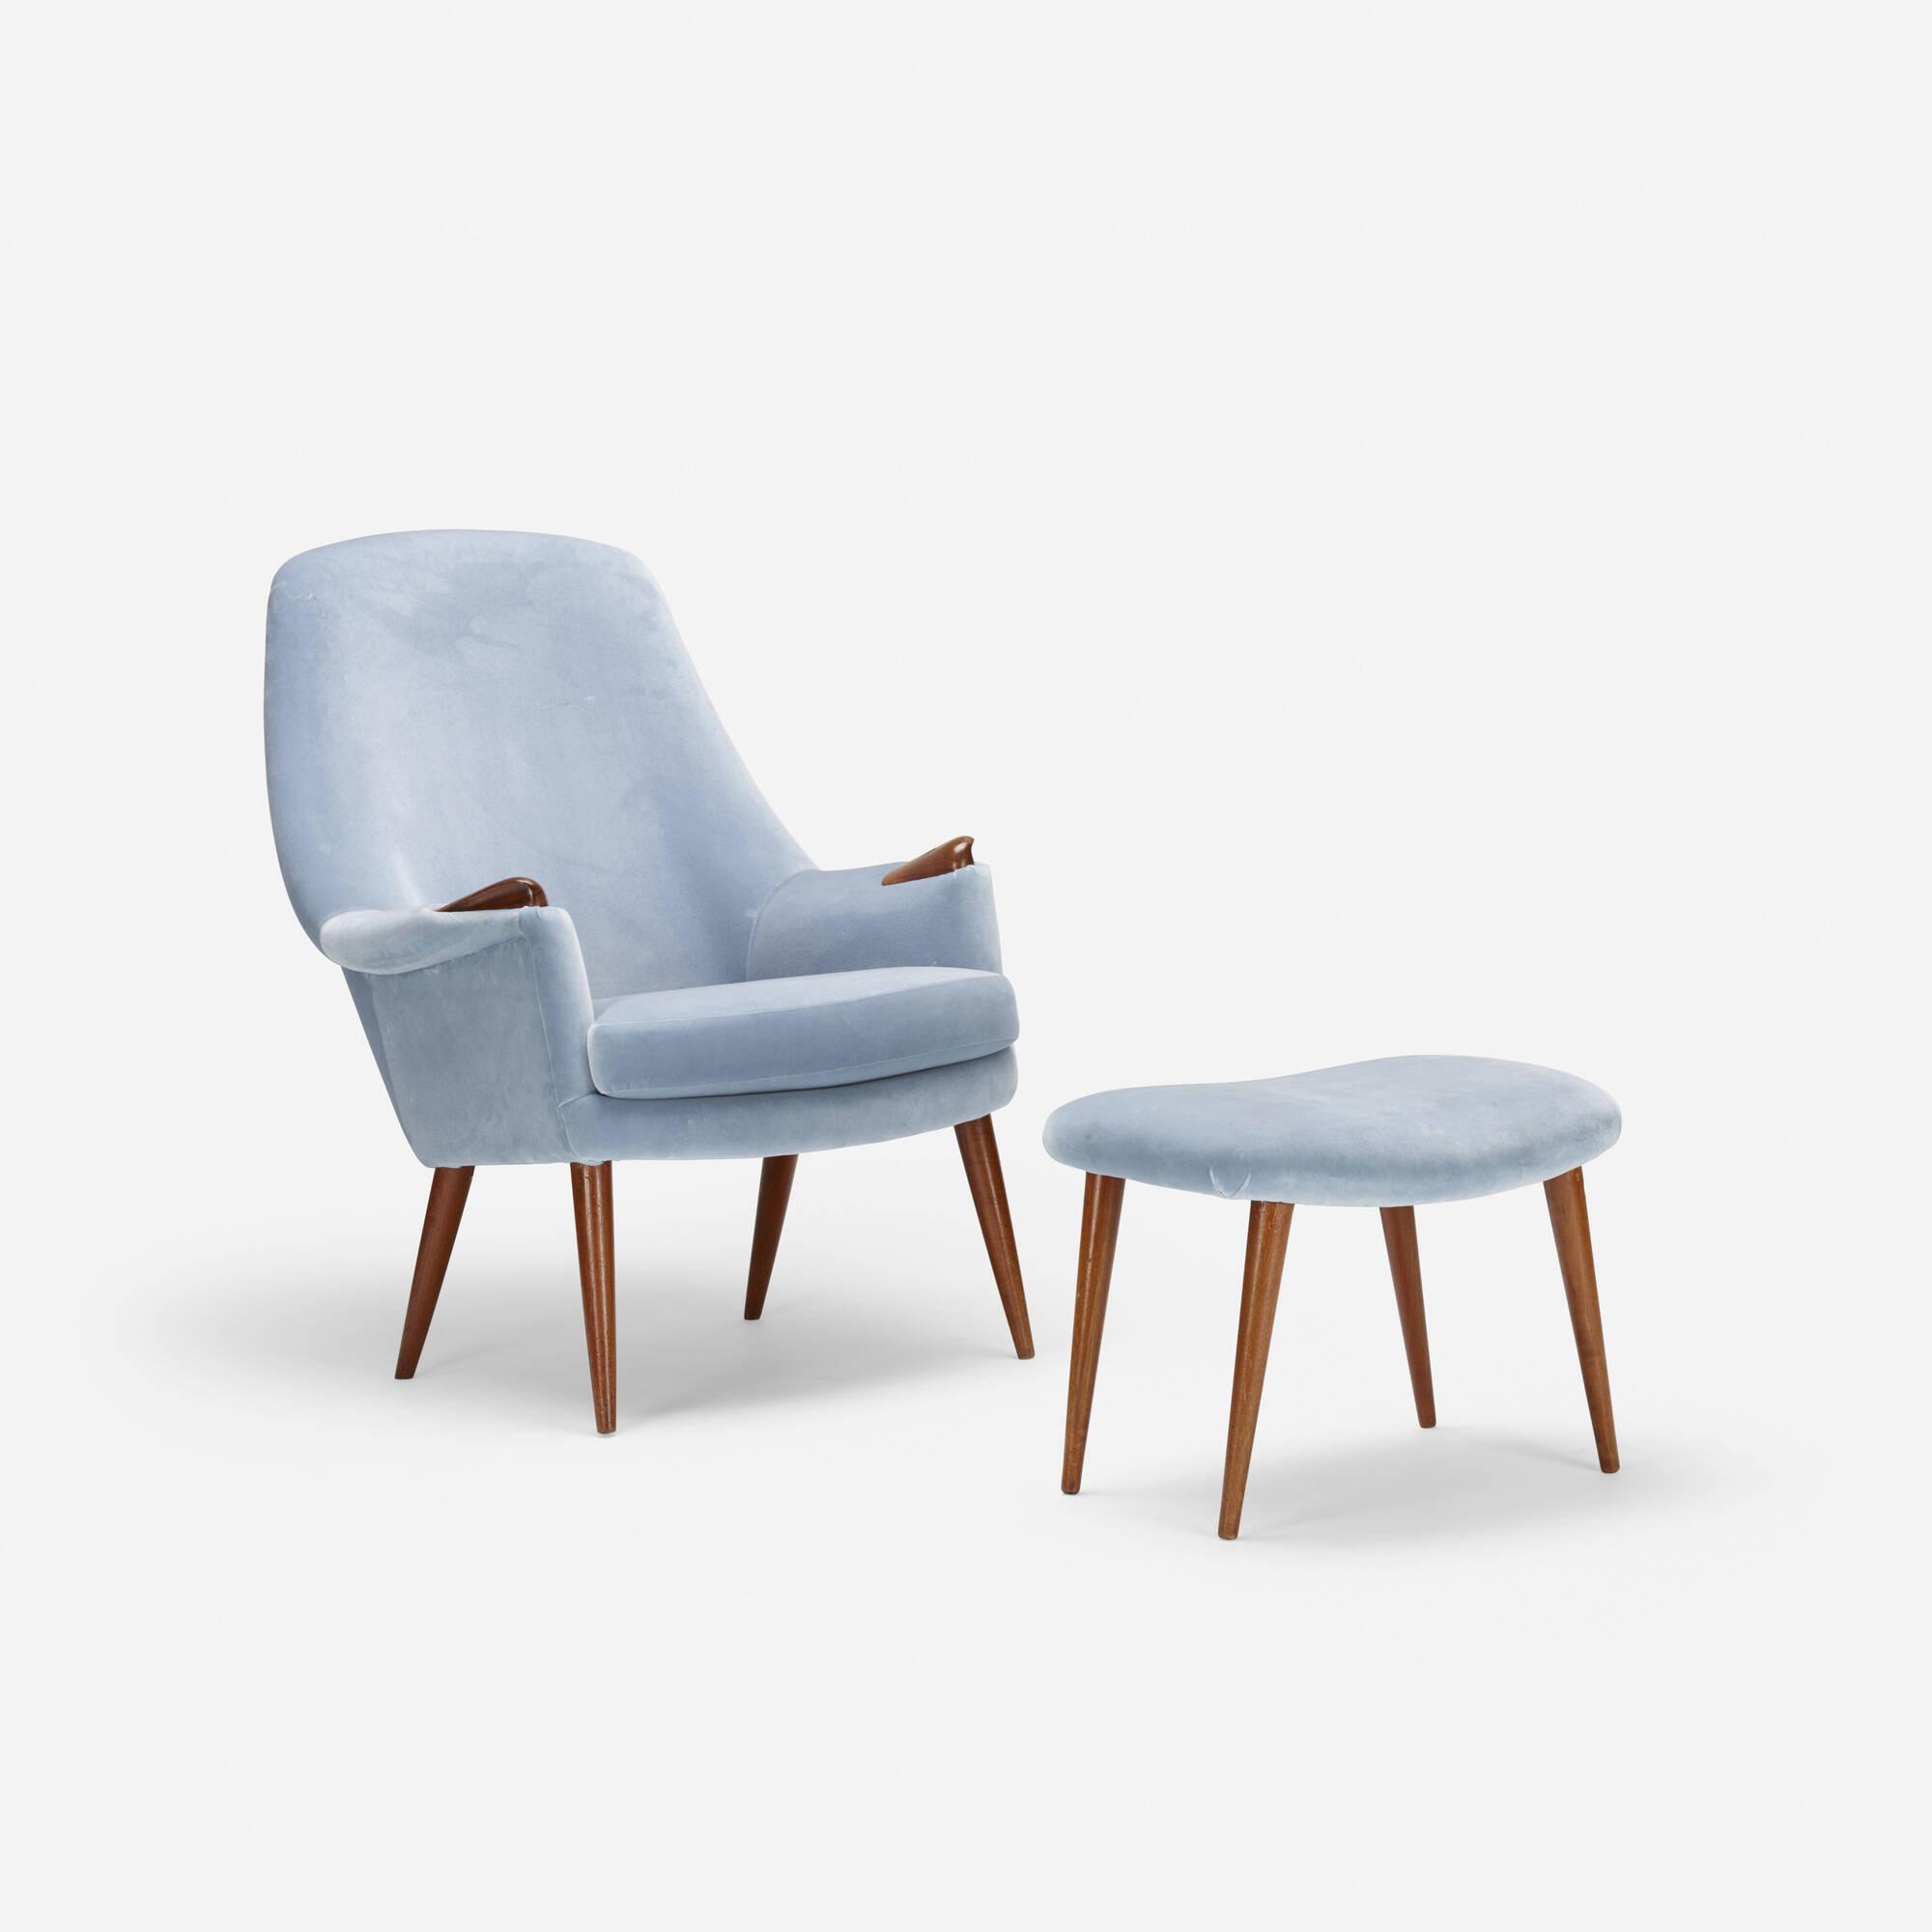 712: Scandinavian / lounge chair and ottoman (1 of 2)